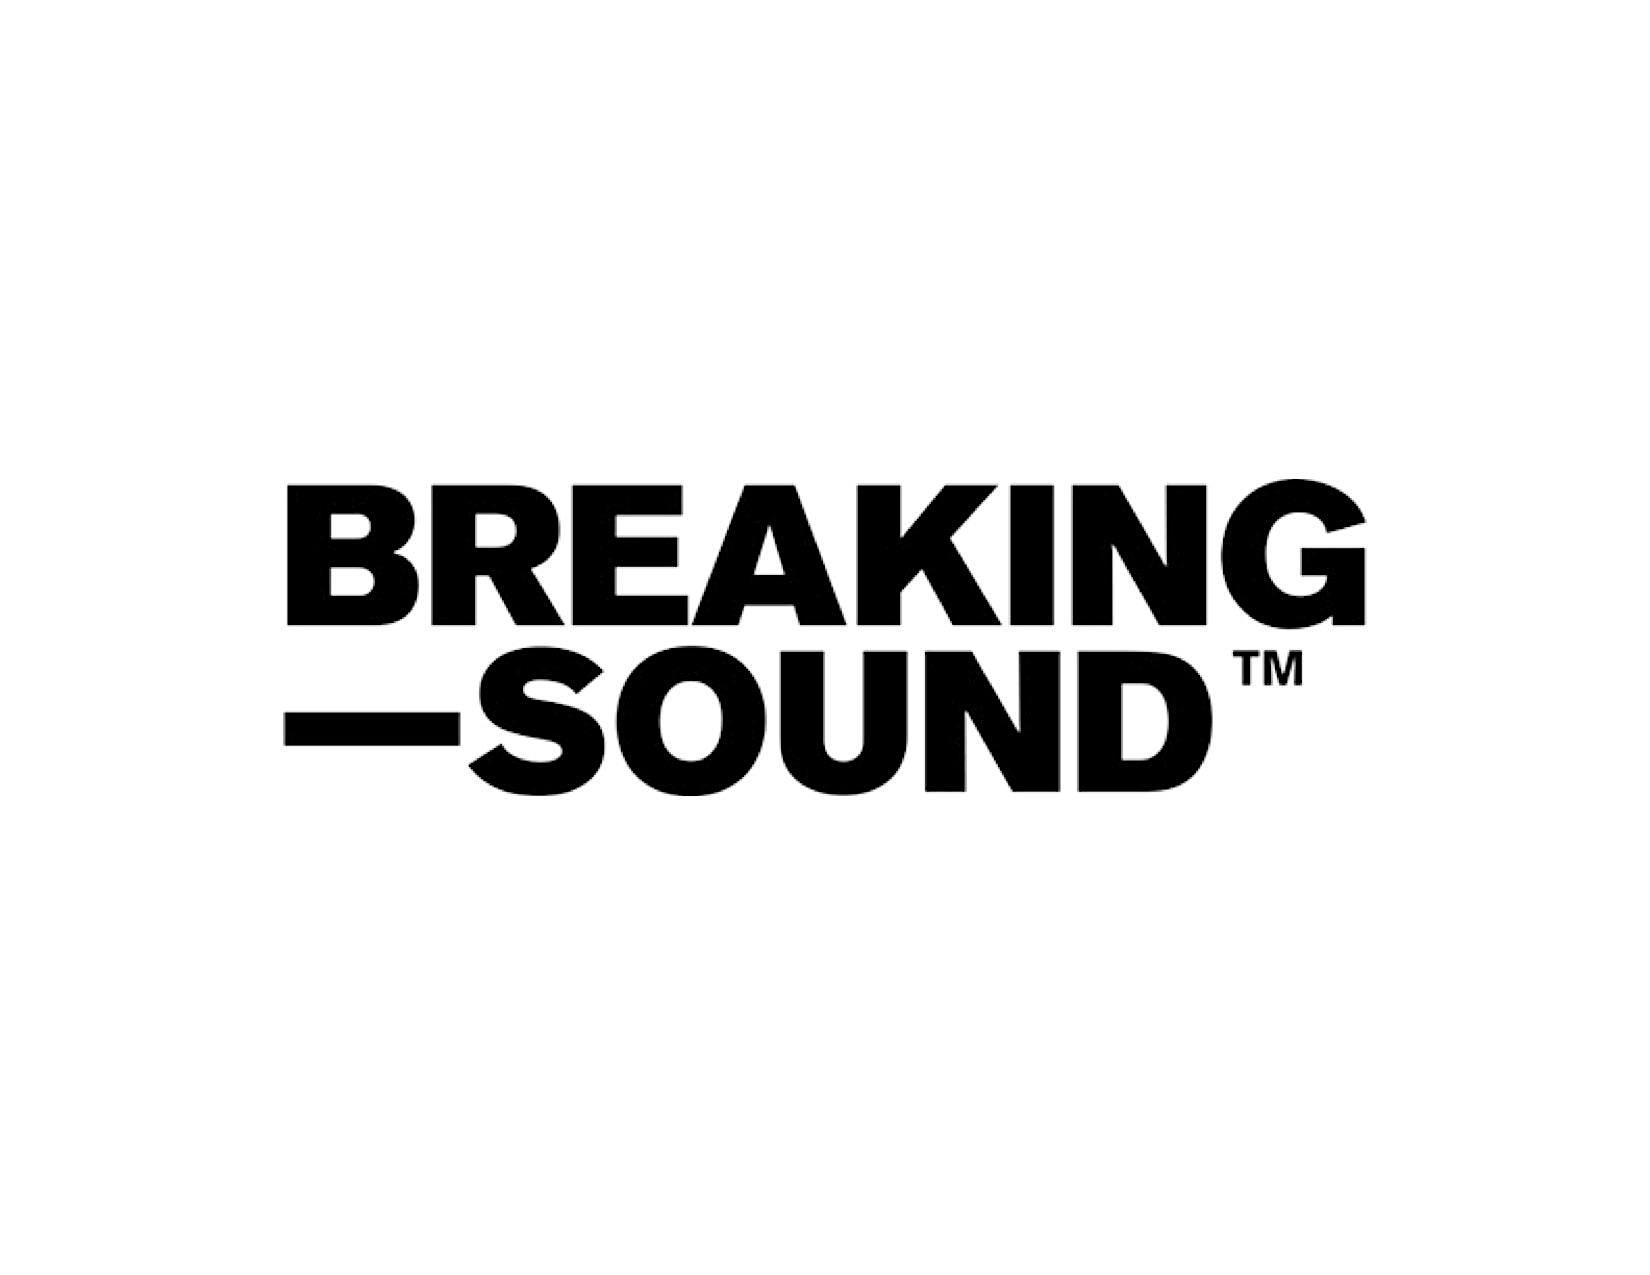 Breaking Sound LA feat. Sophia Gripari, Un'tld, Harry Edohoukwa, + more